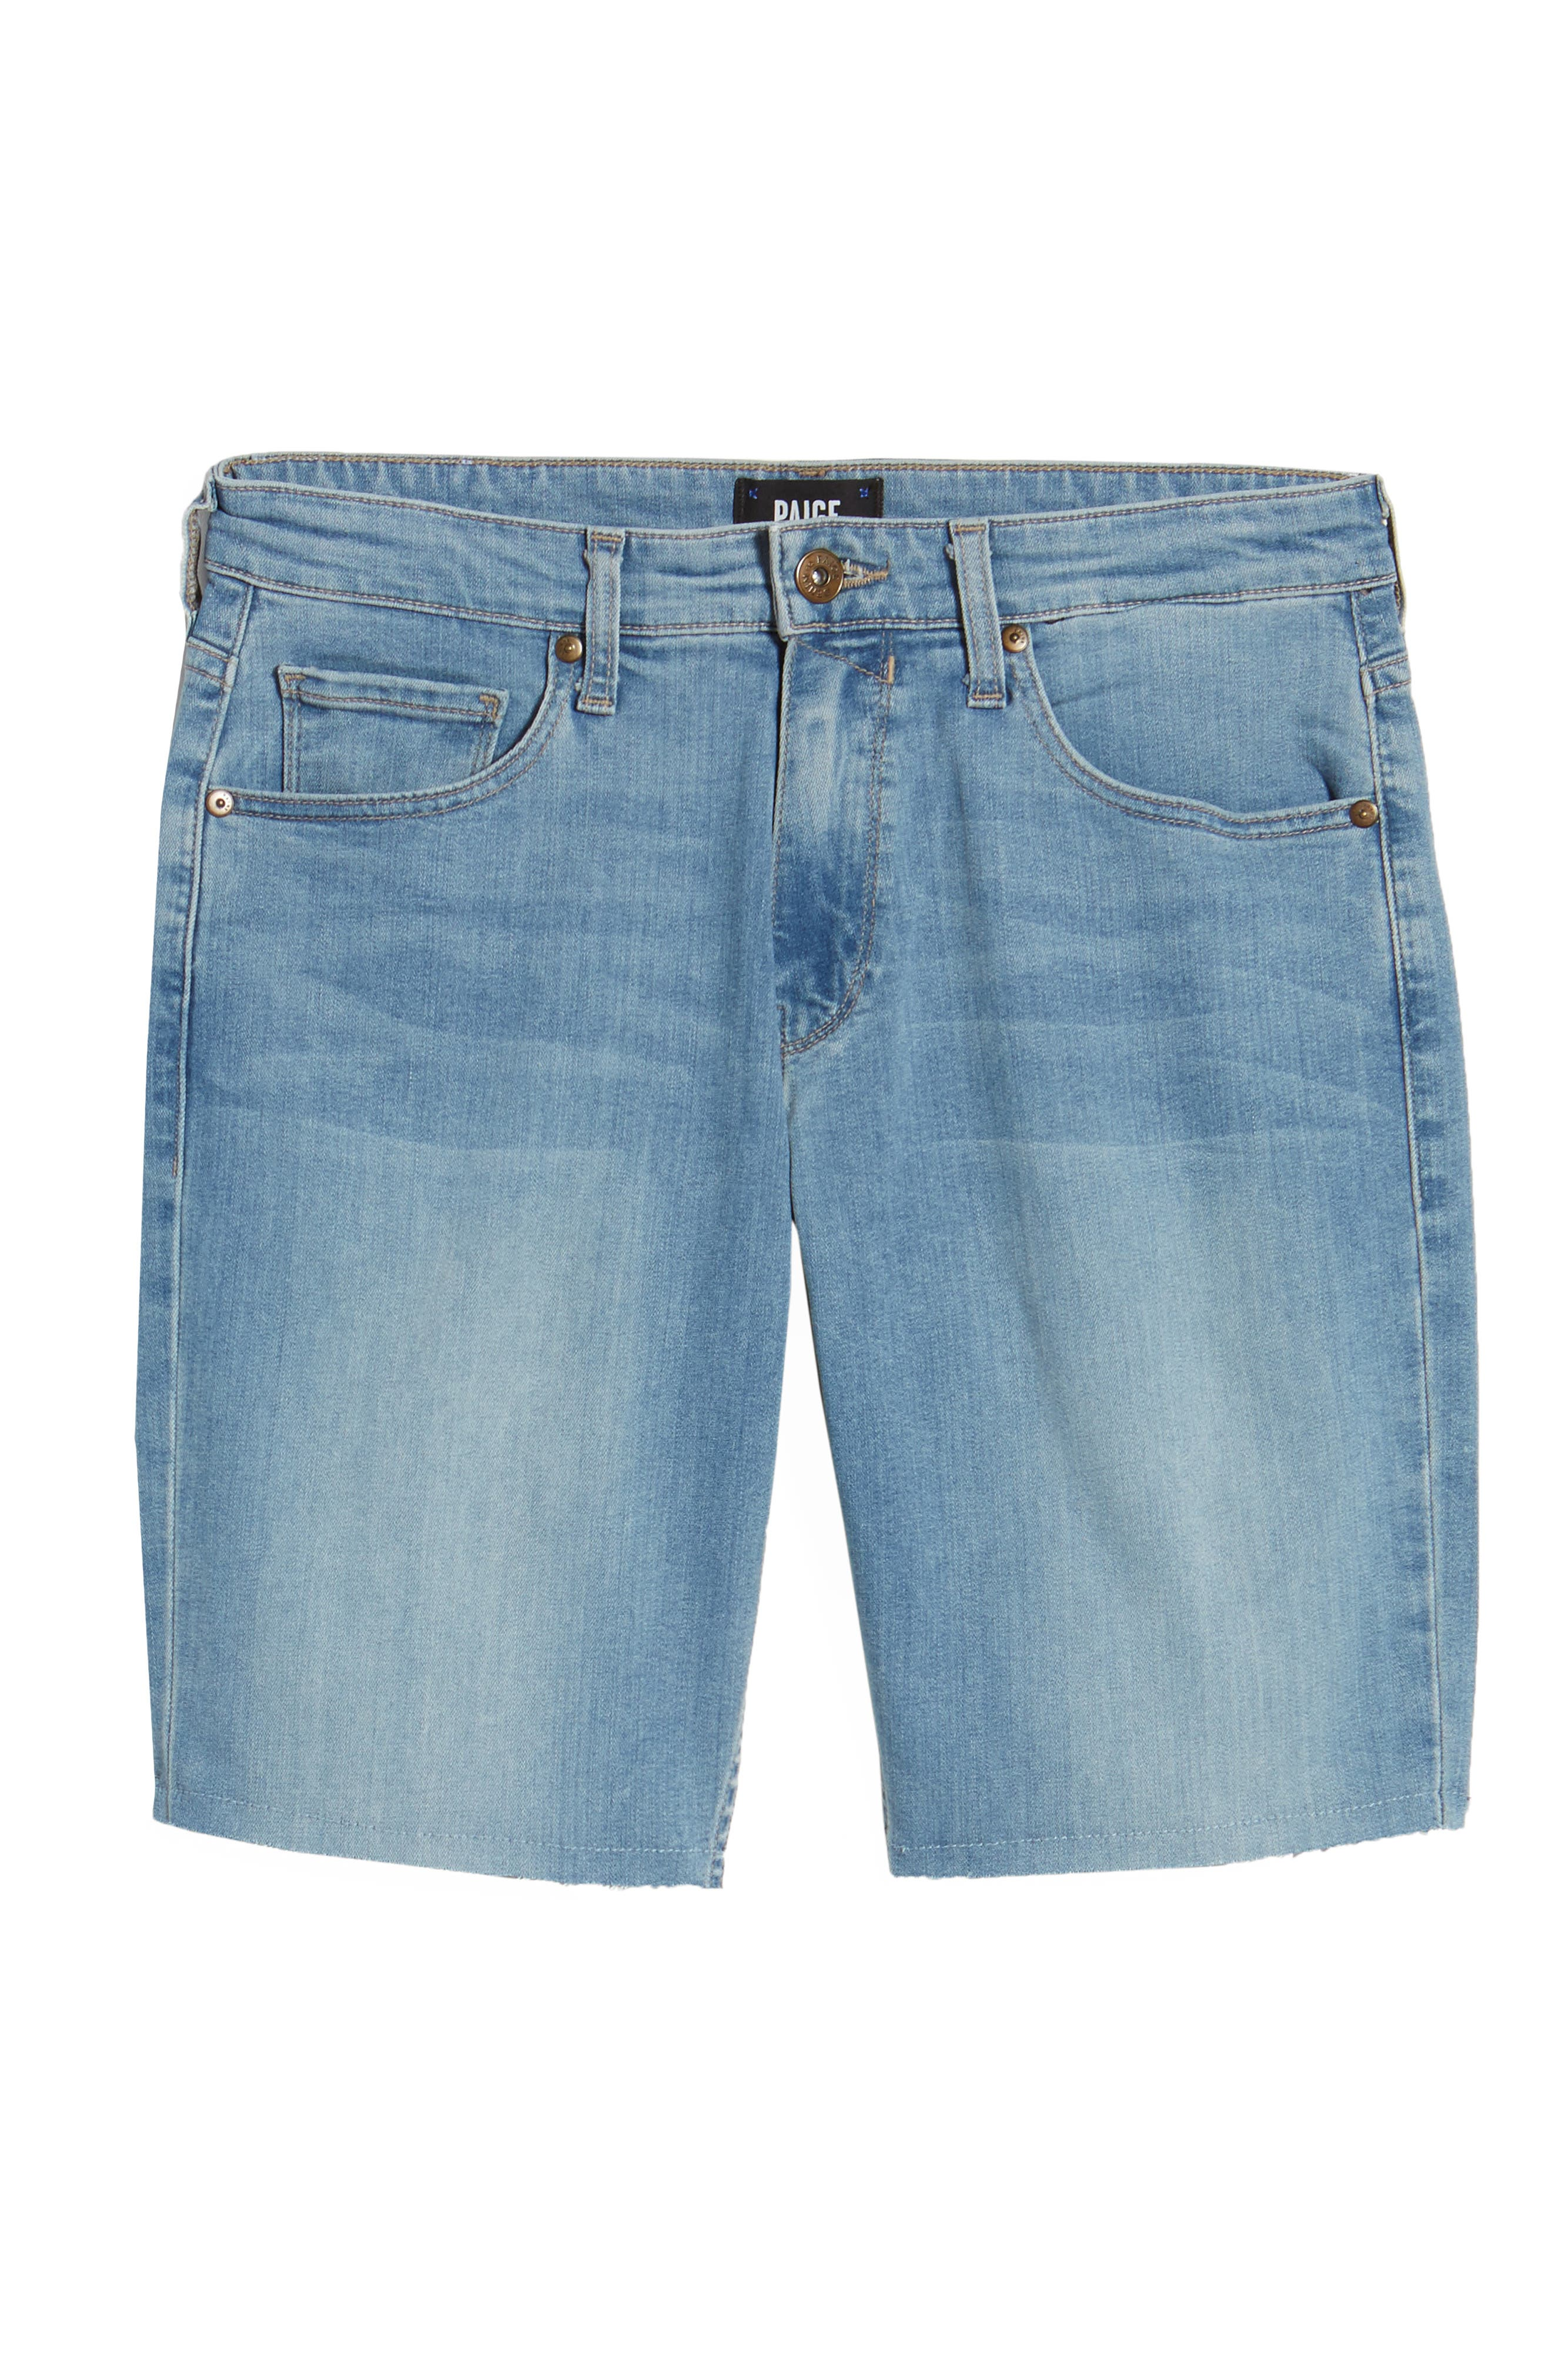 Transcend - Federal Slim Straight Leg Denim Shorts,                             Alternate thumbnail 6, color,                             400